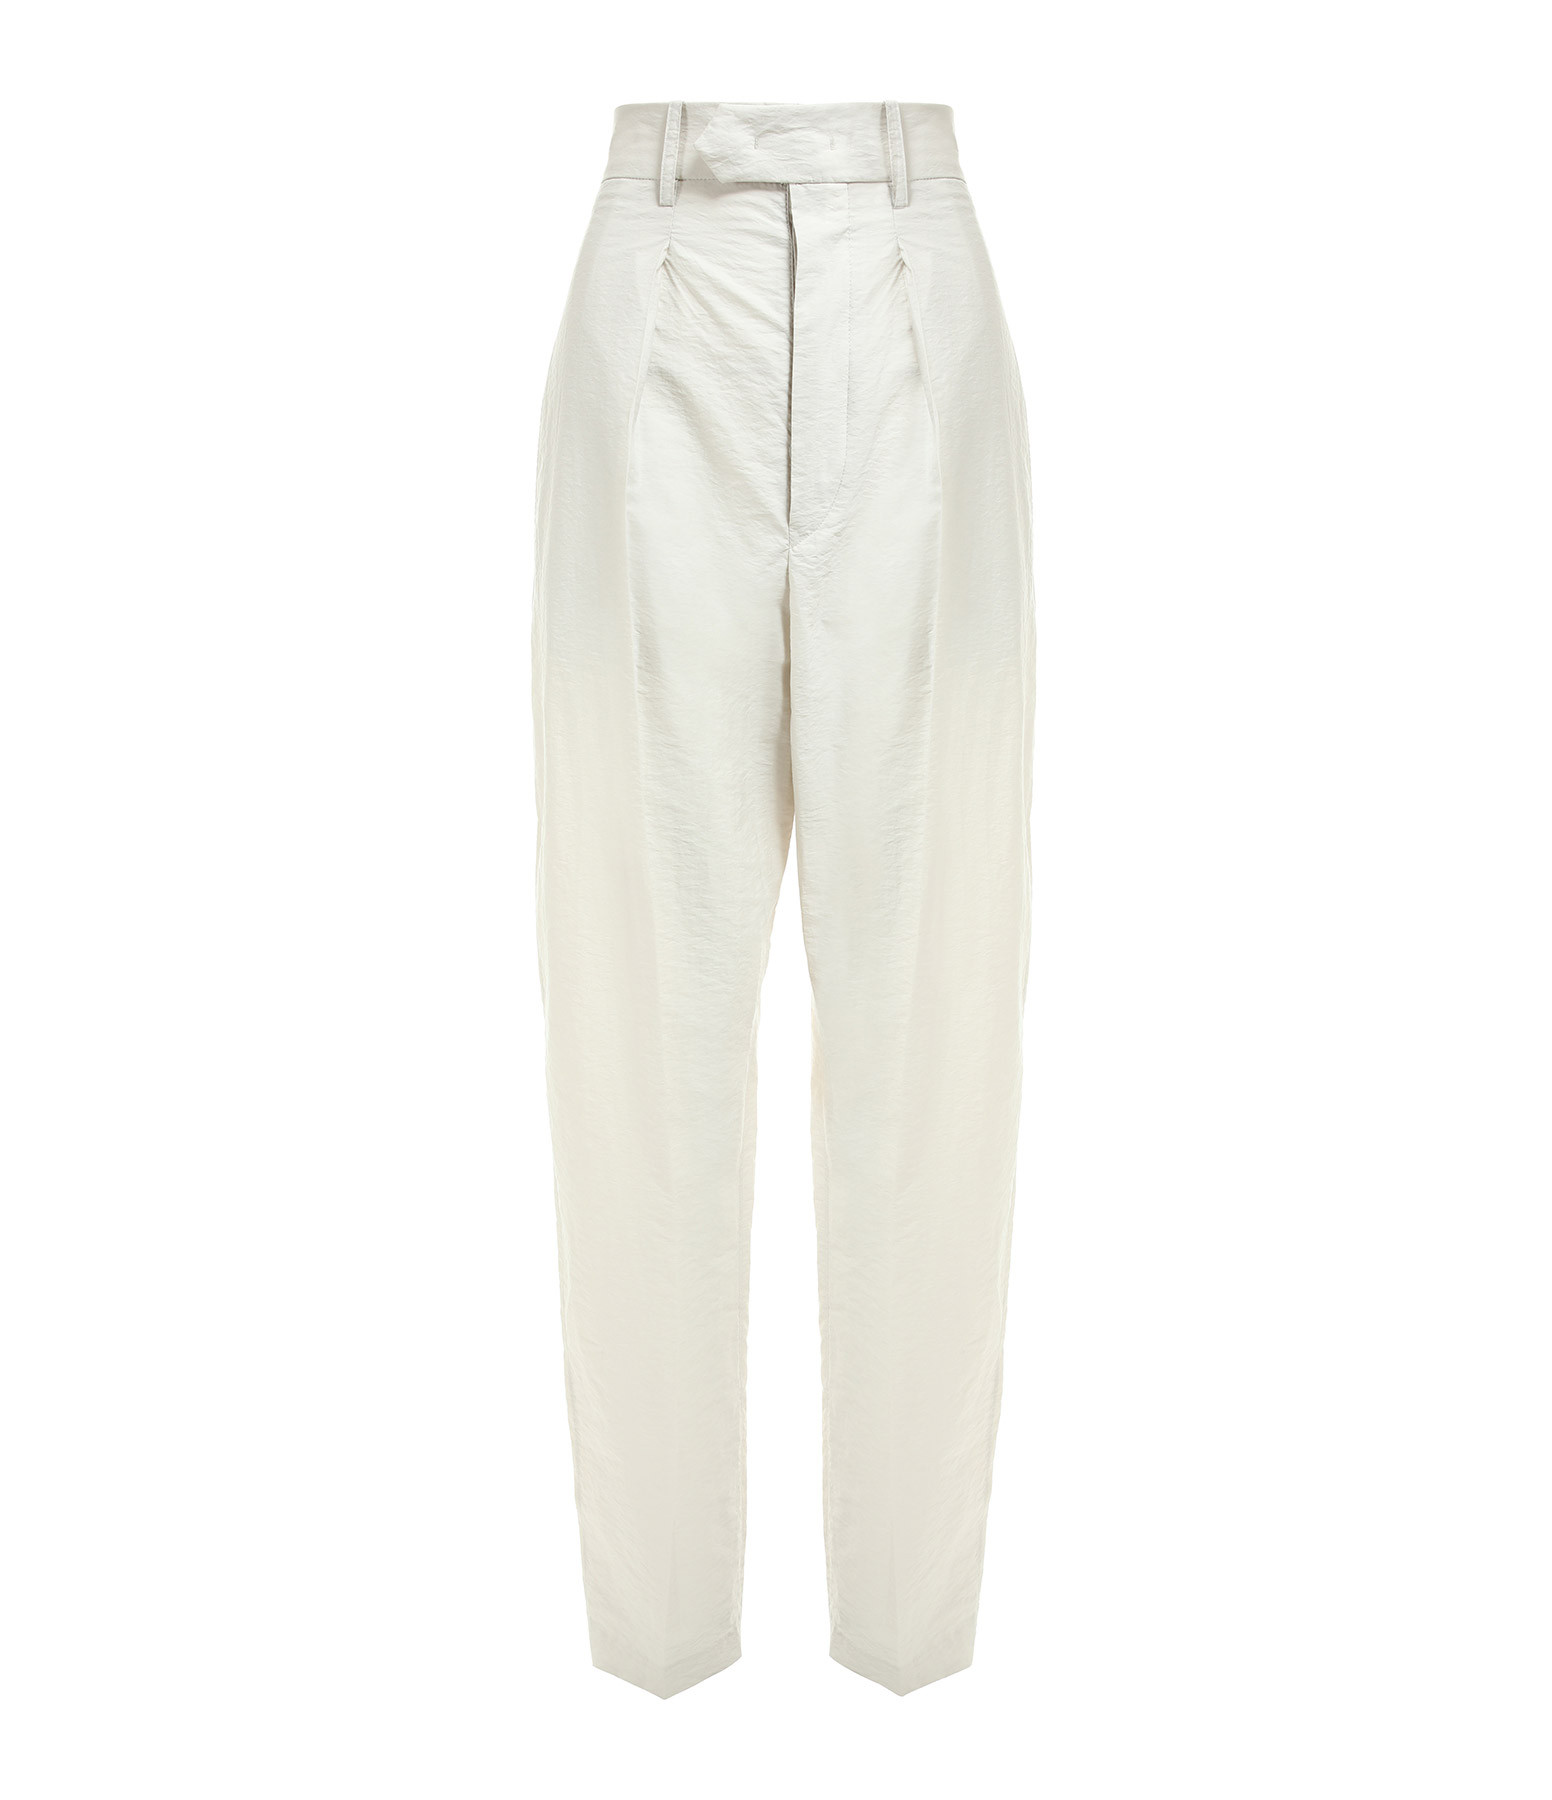 ISABEL MARANT - Pantalon Tacoma Craie